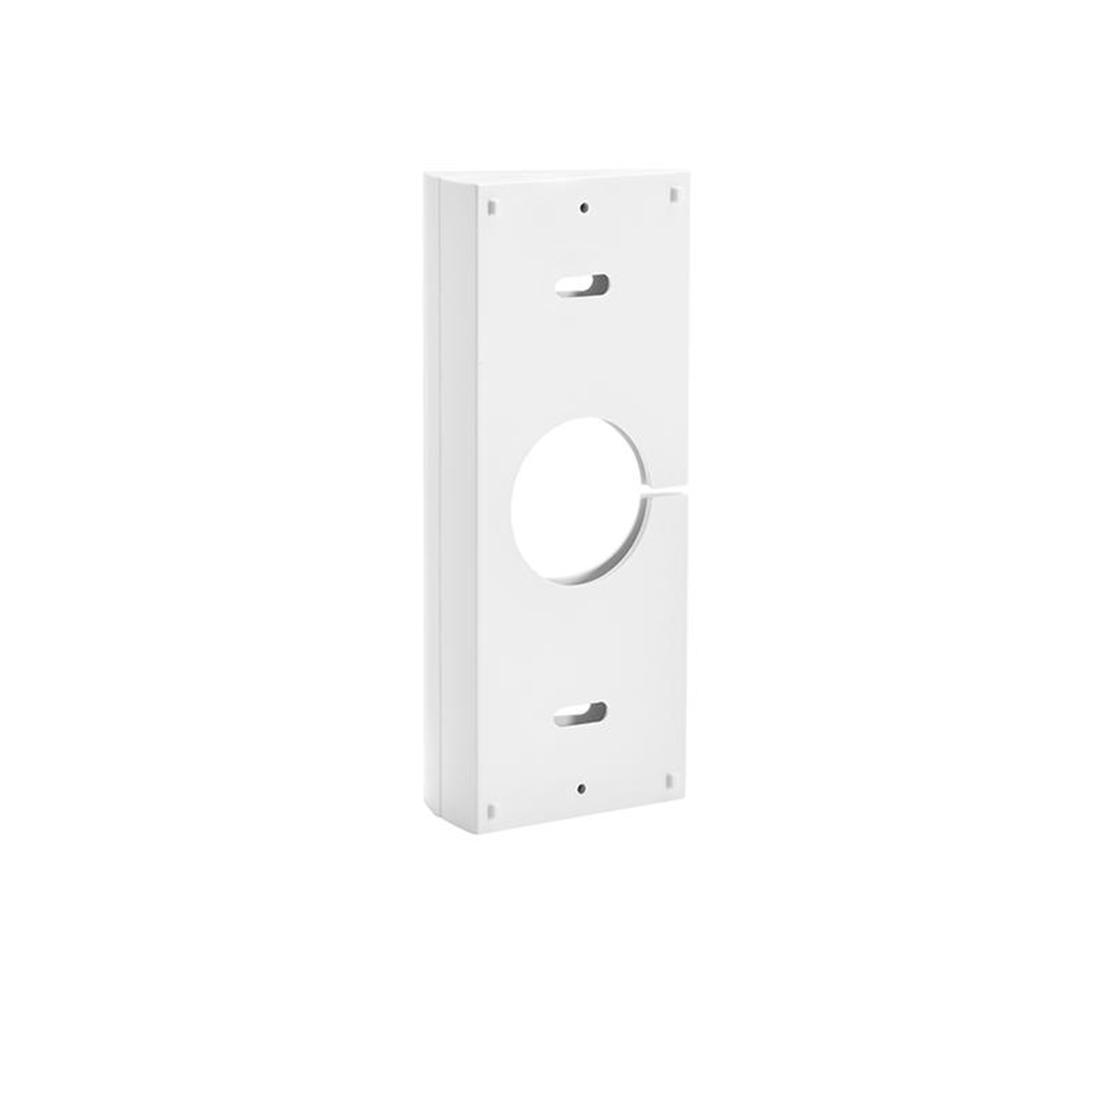 ring doorbell for sale smeg induction hob wiring diagram pro corner kit video